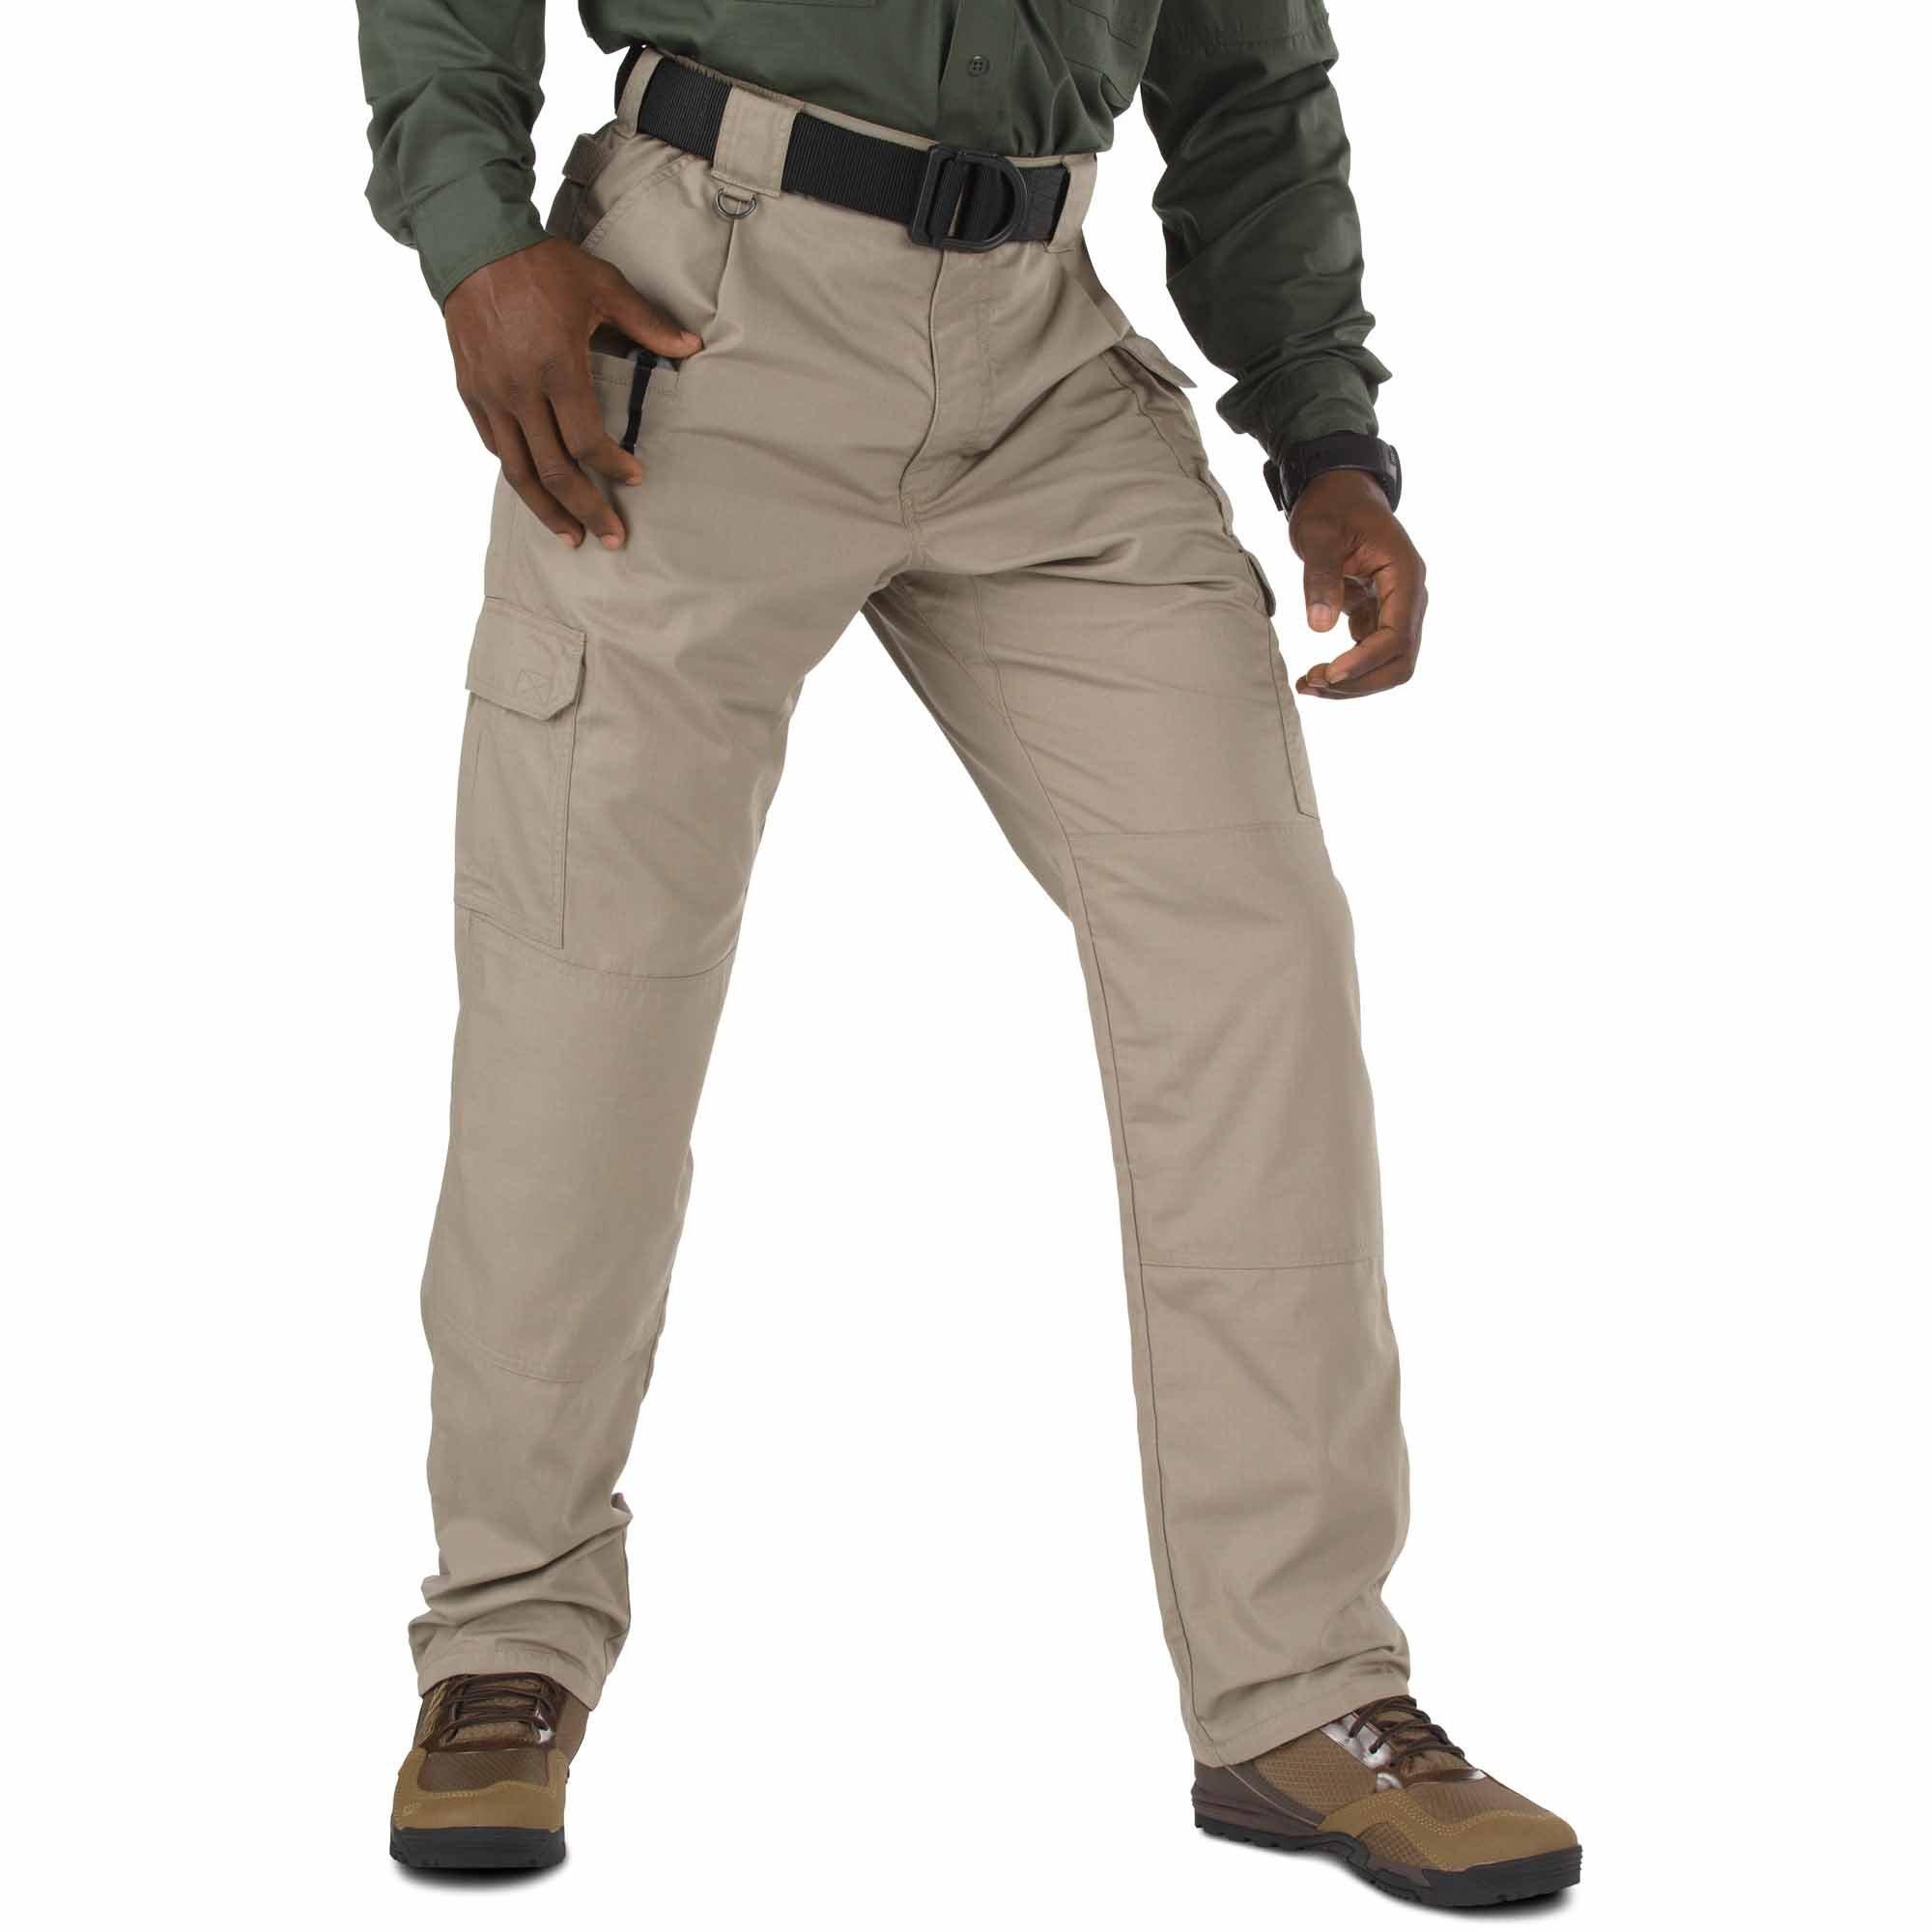 5.11 Men's TACLITE Pro Tactical Pants, Style 74273, Stone, 32Wx30L by 5.11